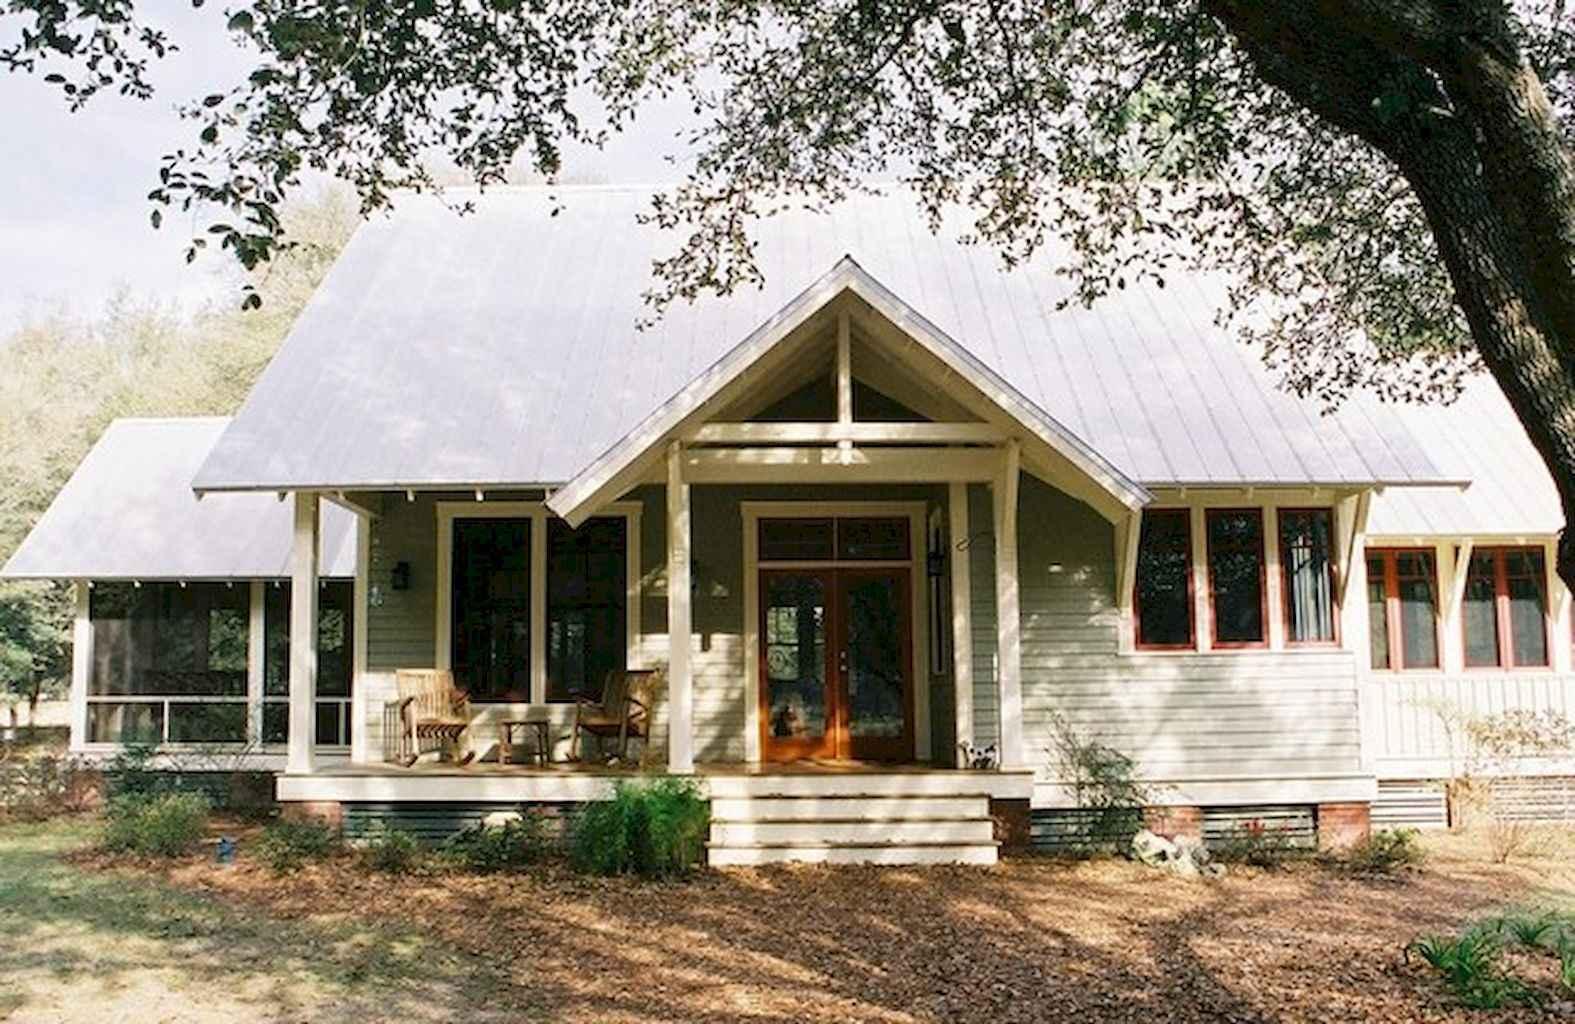 60 amazing farmhouse plans cracker style design ideas (42)